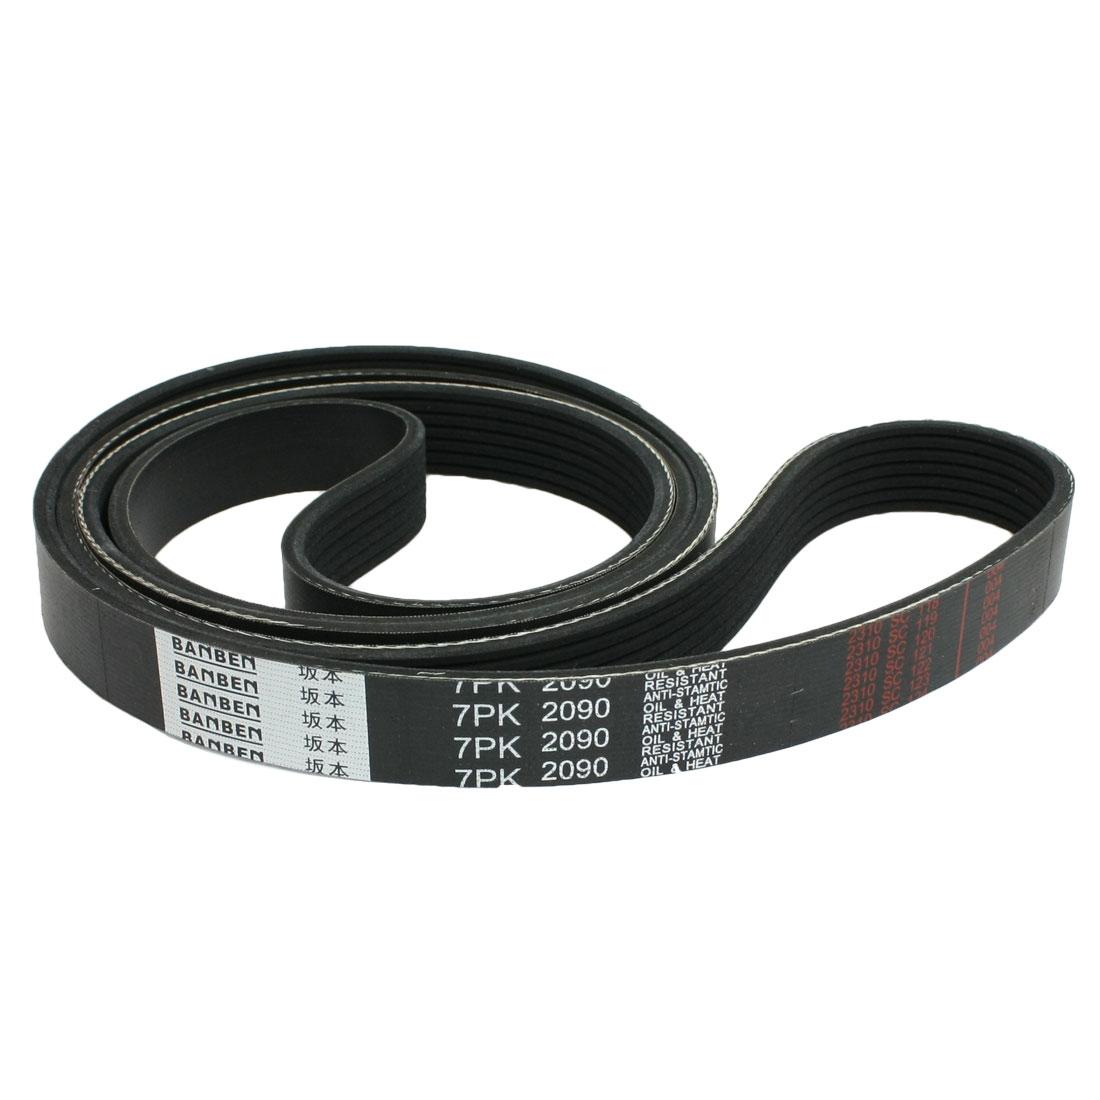 7PK2090 Car Auto Black Rubber Poly-V Serpentine Belt